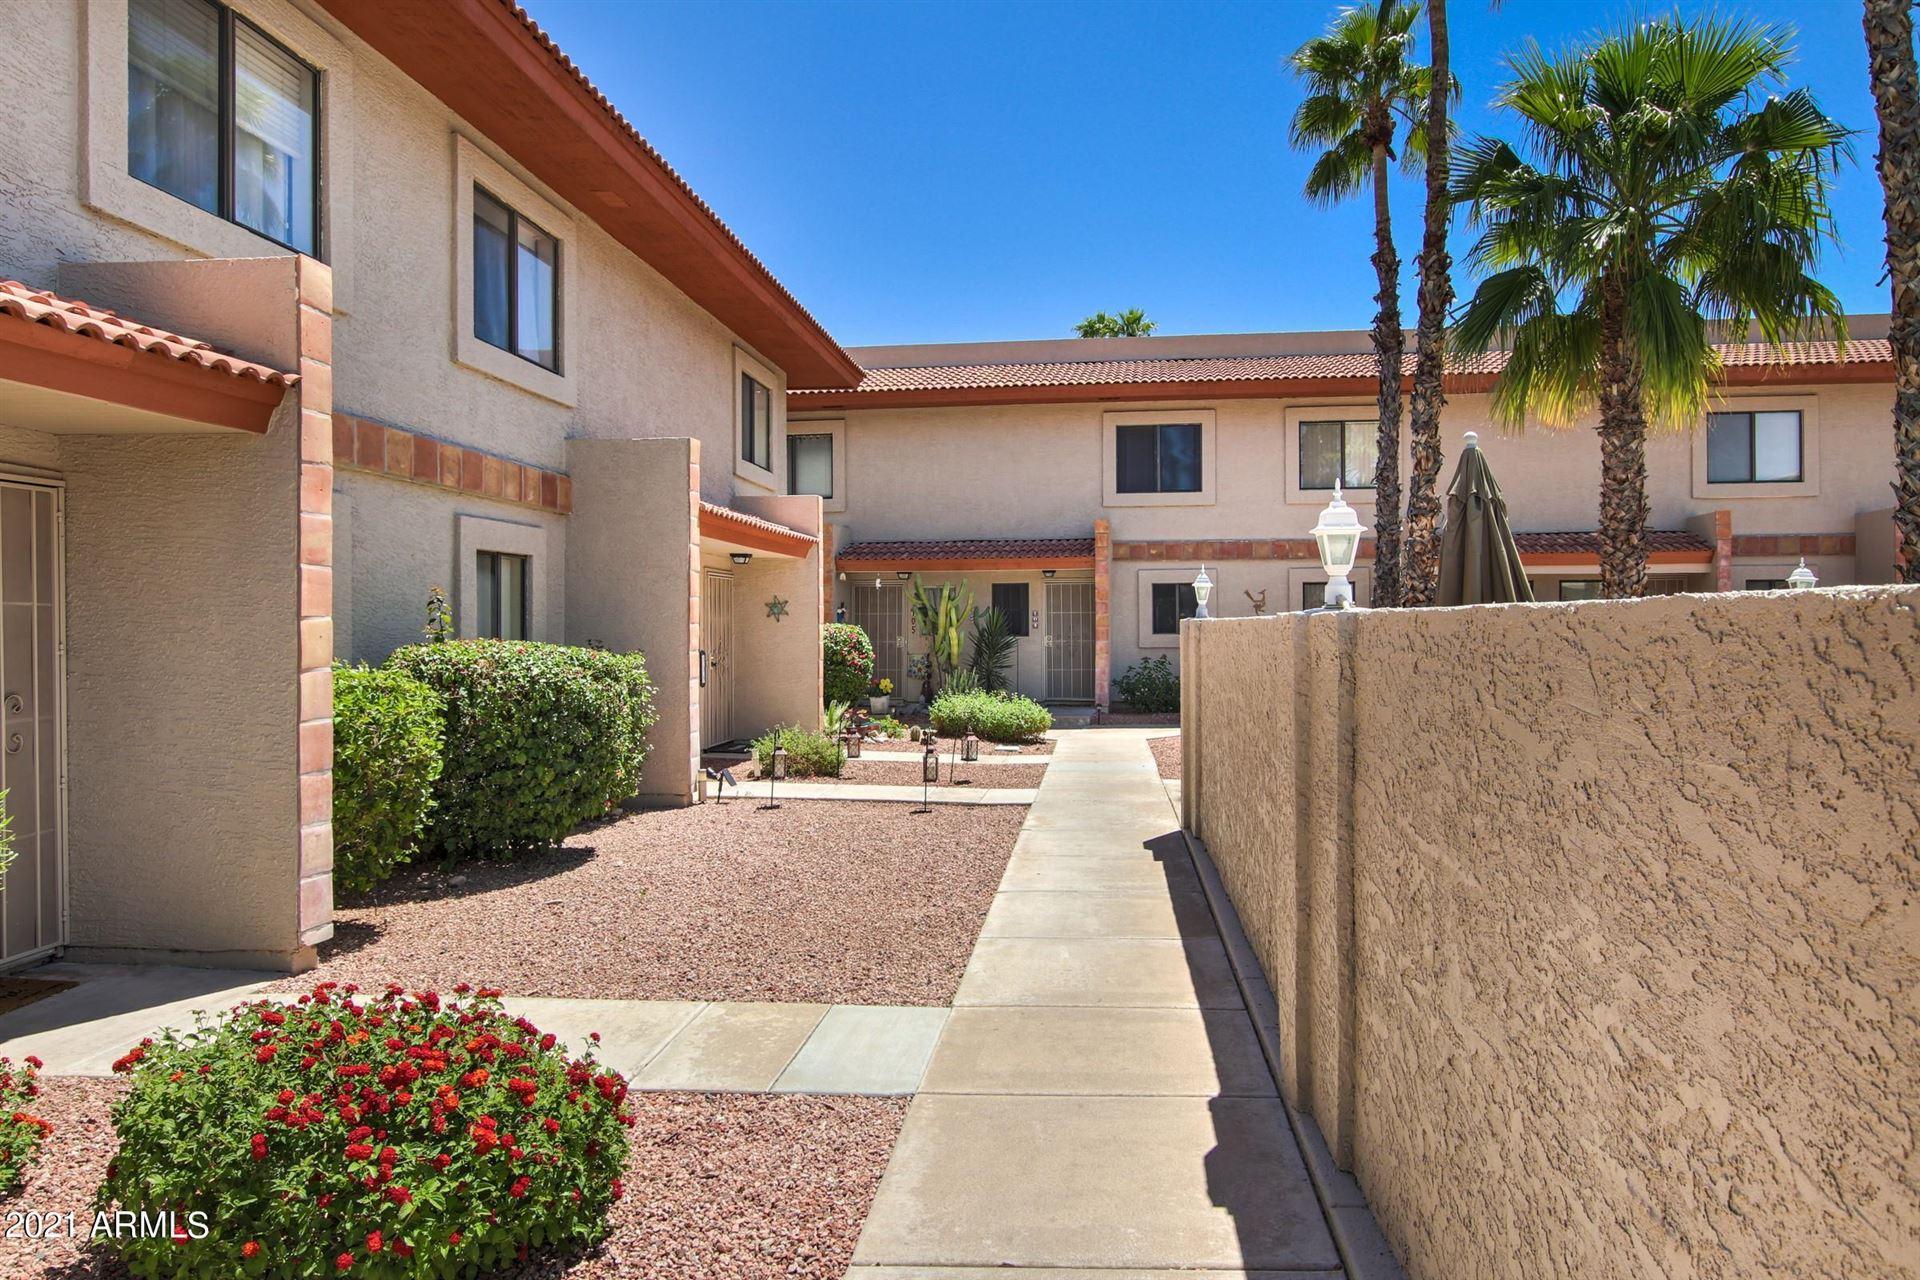 Photo of 12619 N LA MONTANA Drive #104, Fountain Hills, AZ 85268 (MLS # 6232236)